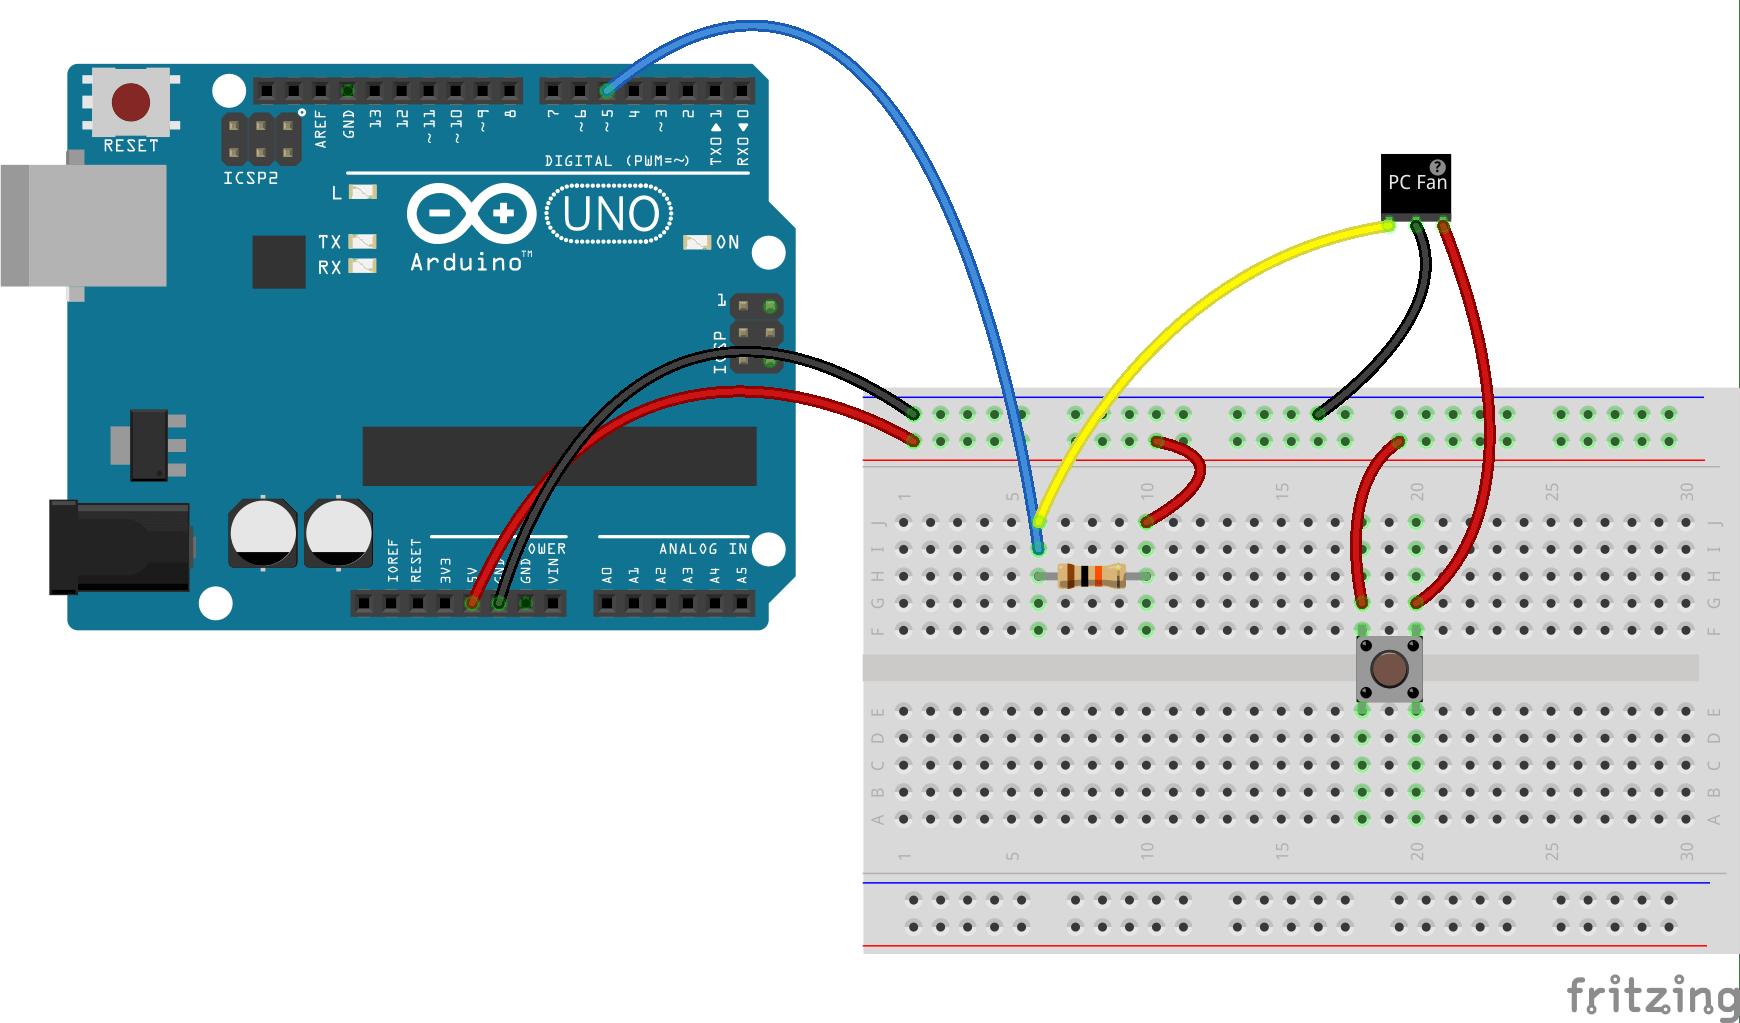 pc 3 pin fan wire diagram wiring library usb cable diagram pc fan diagram [ 1740 x 1023 Pixel ]